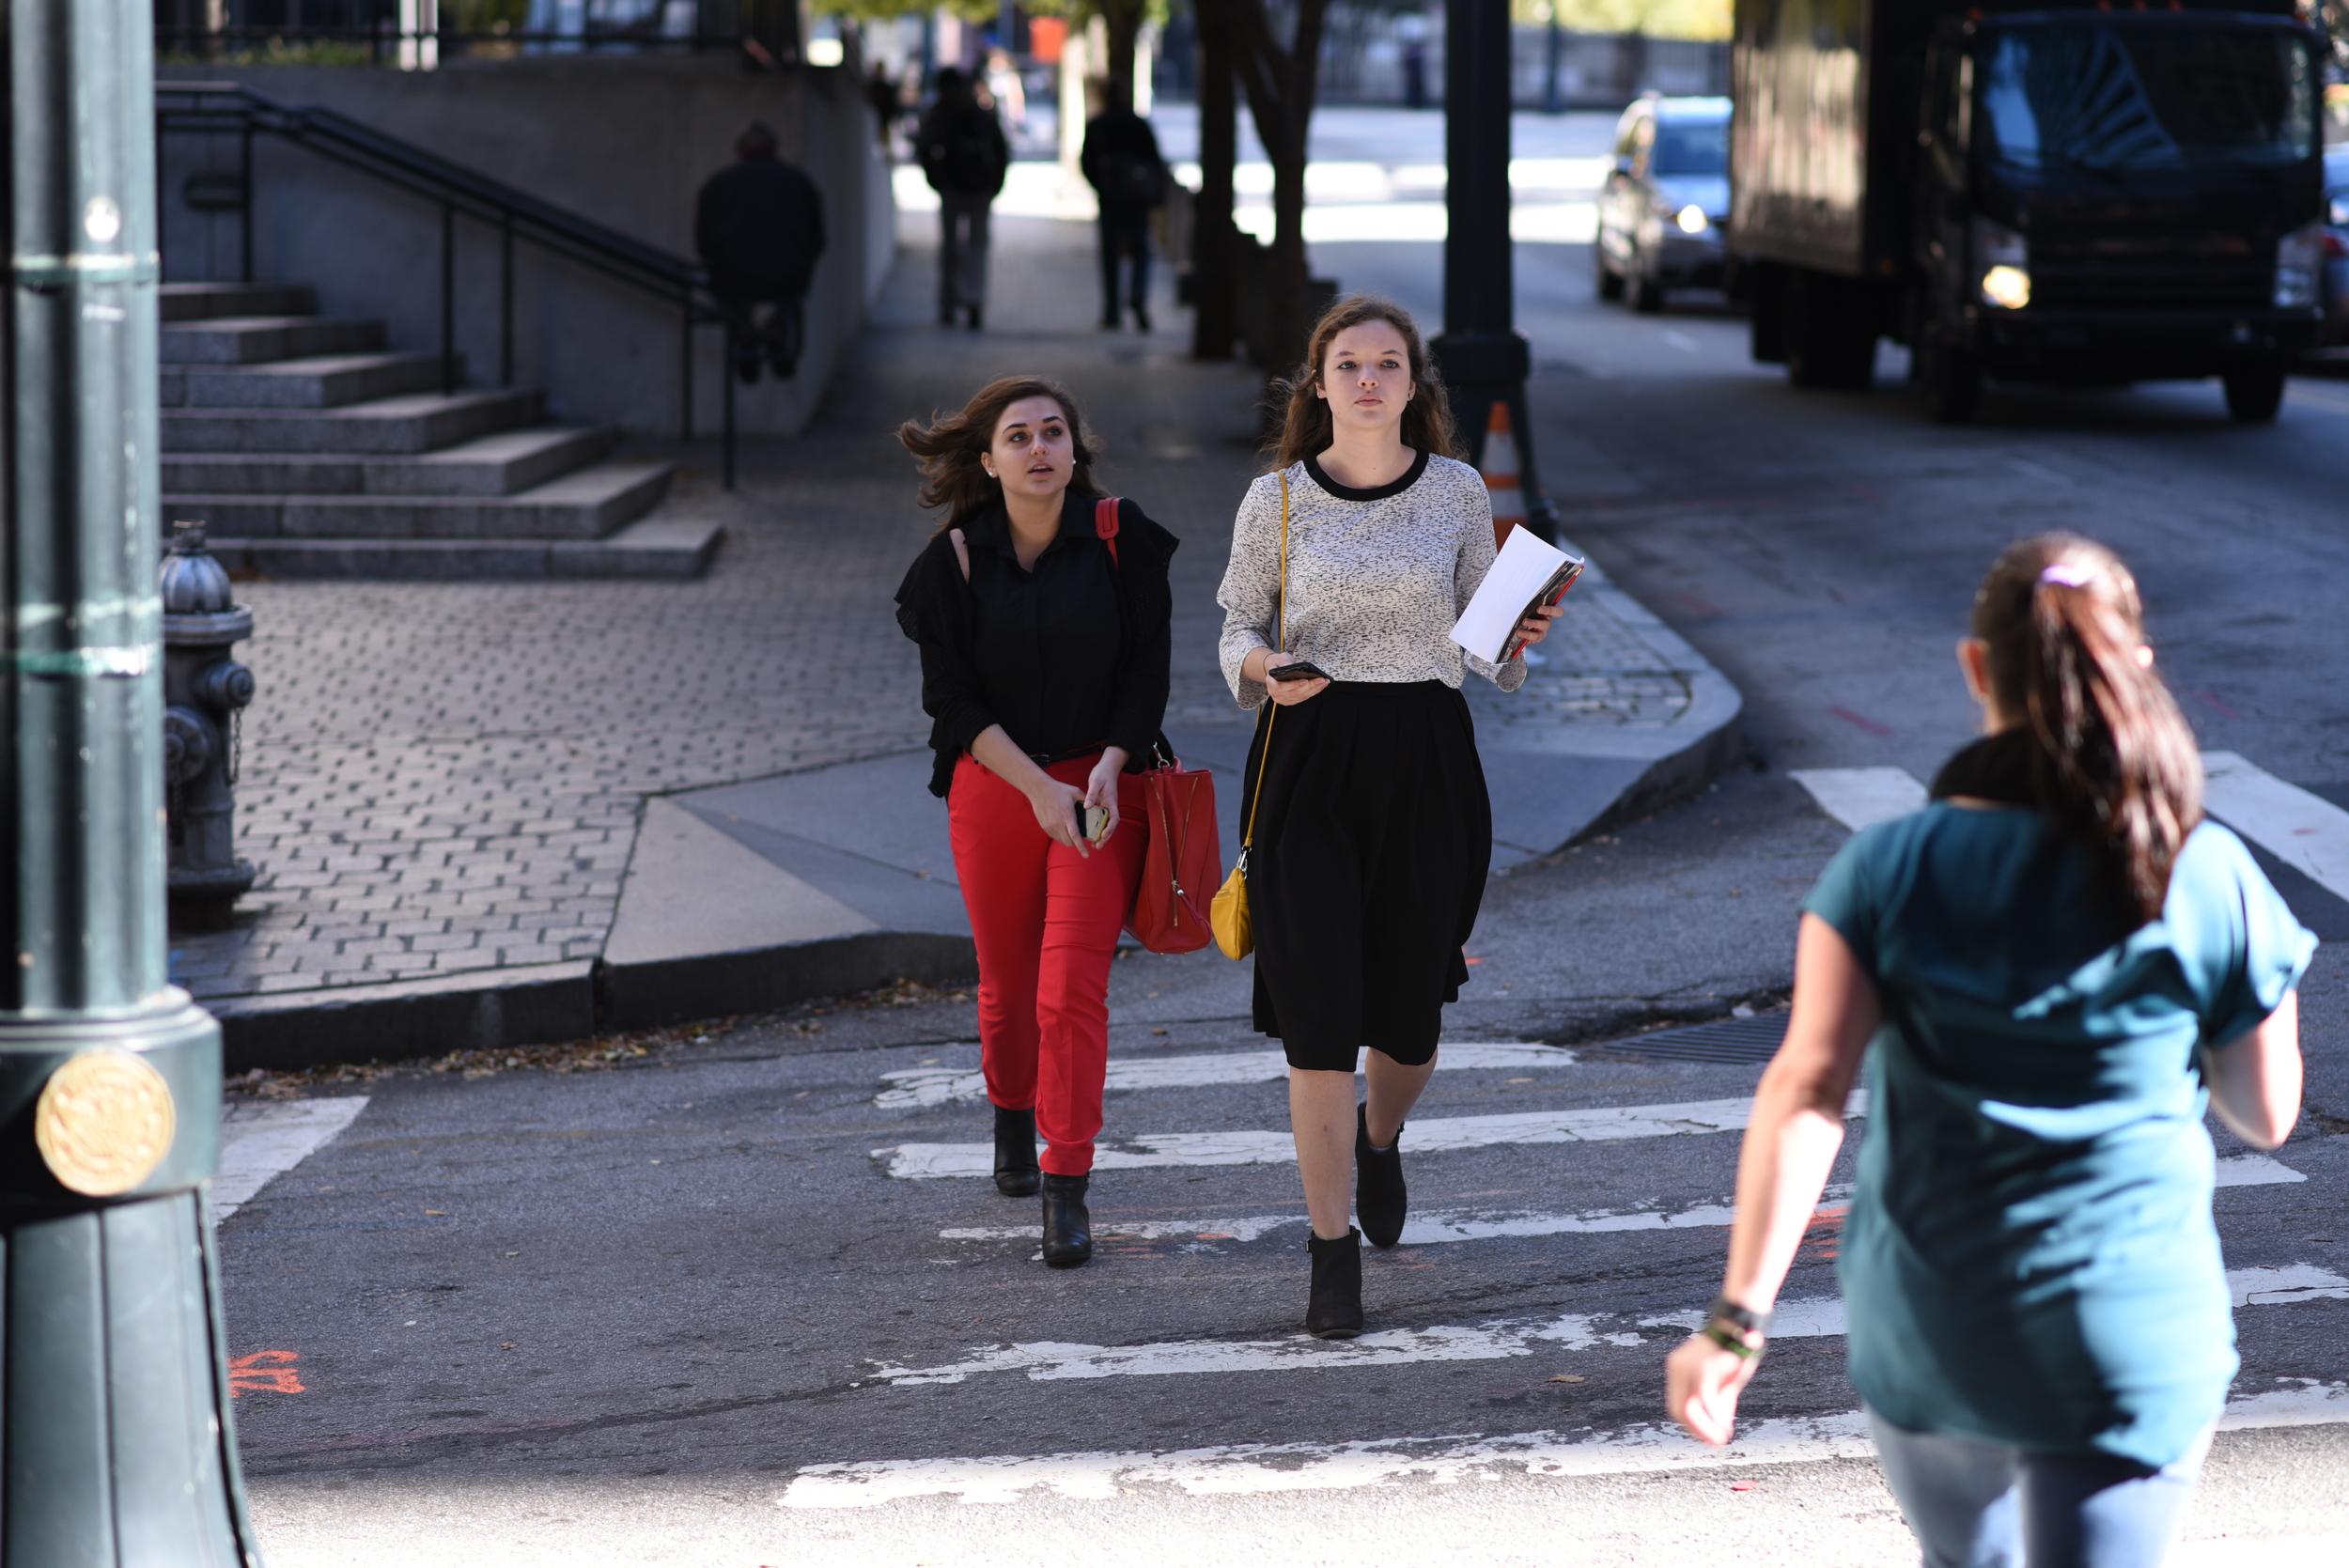 girls-crossing-street.jpg